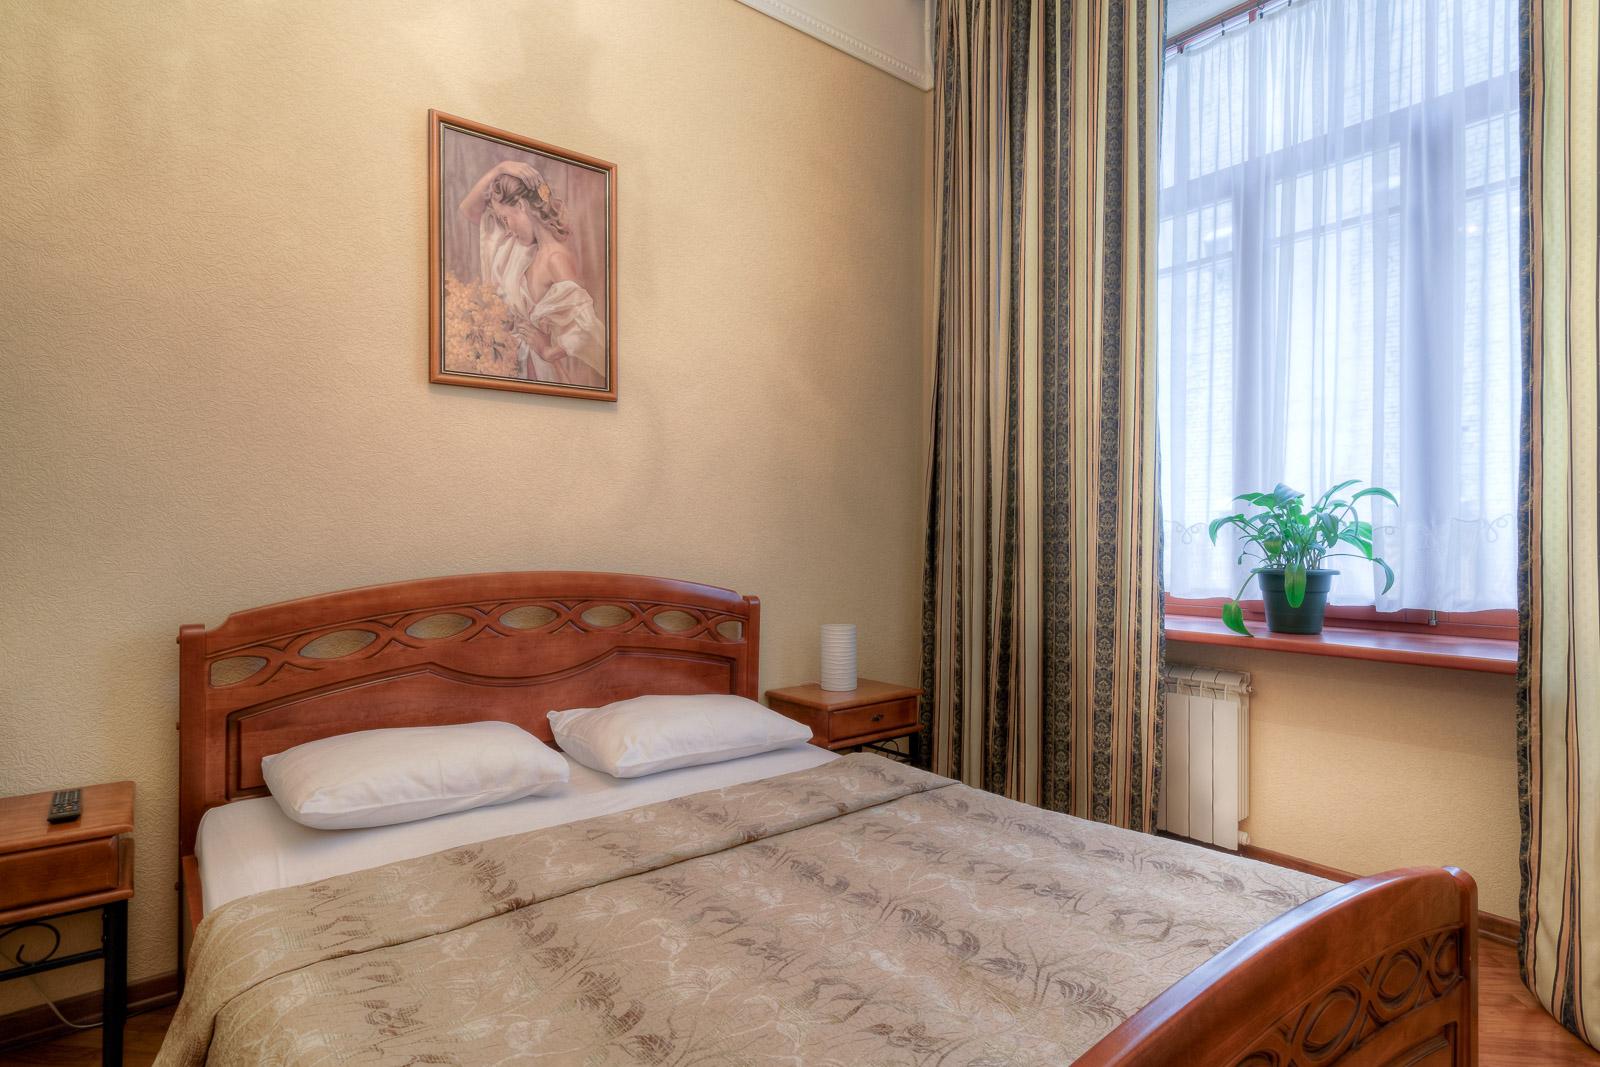 http://city-otel.ru/wp-content/uploads/2018/03/hotel_sity_polulux_2.jpg